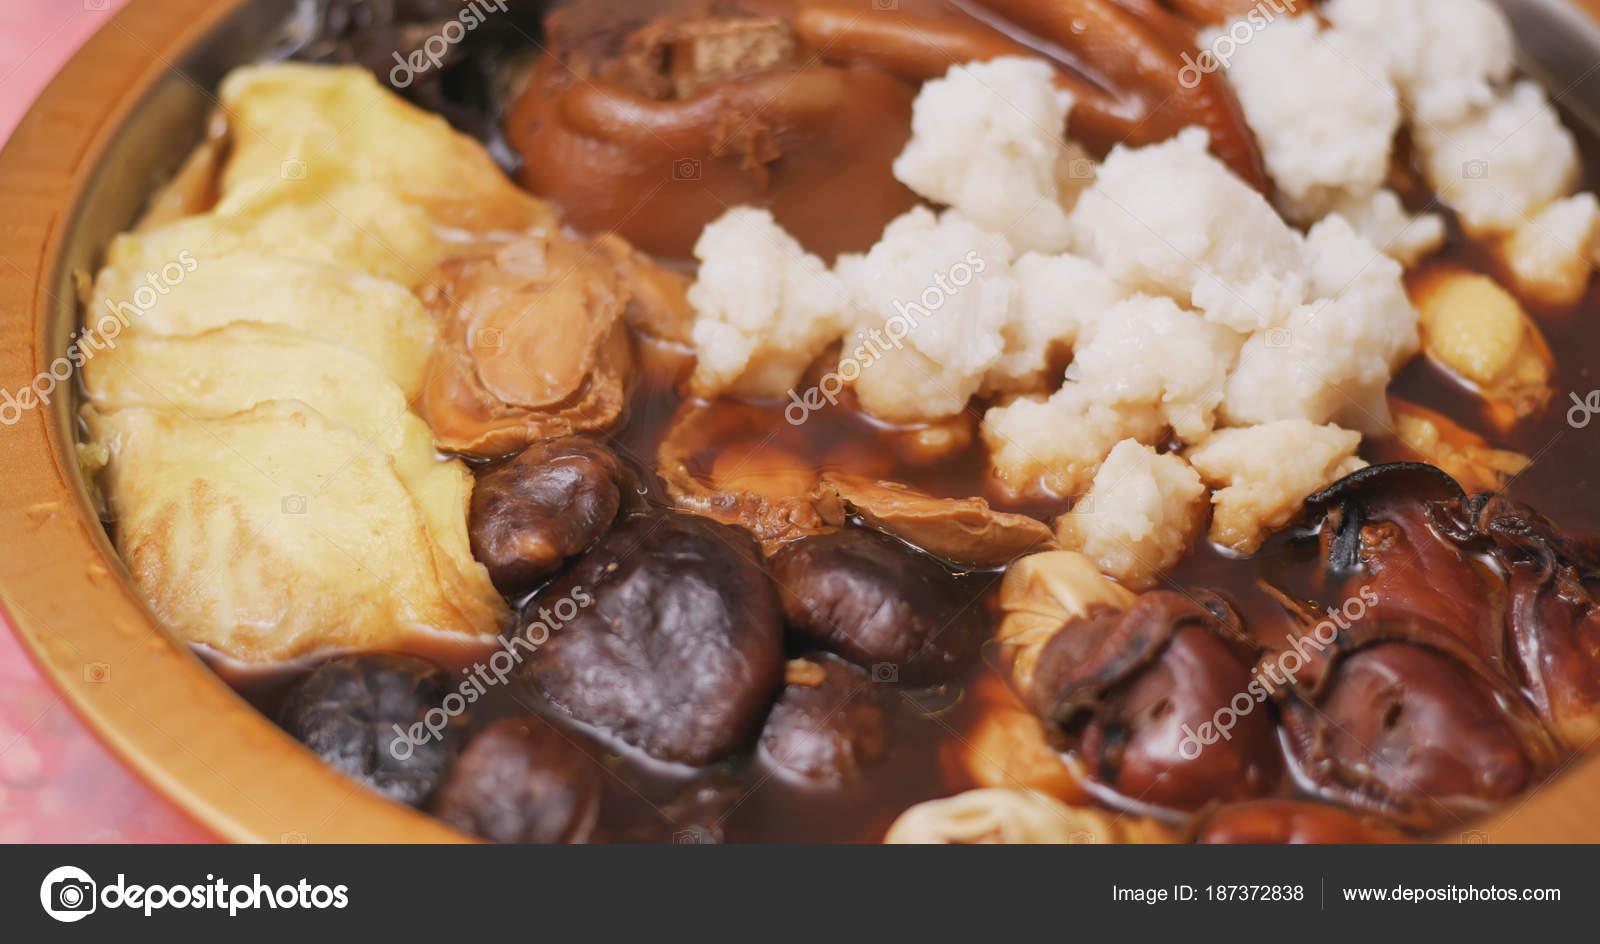 Hong Kong Keuken : Hong kong keuken poon choi voor nieuwe maanjaar u stockfoto